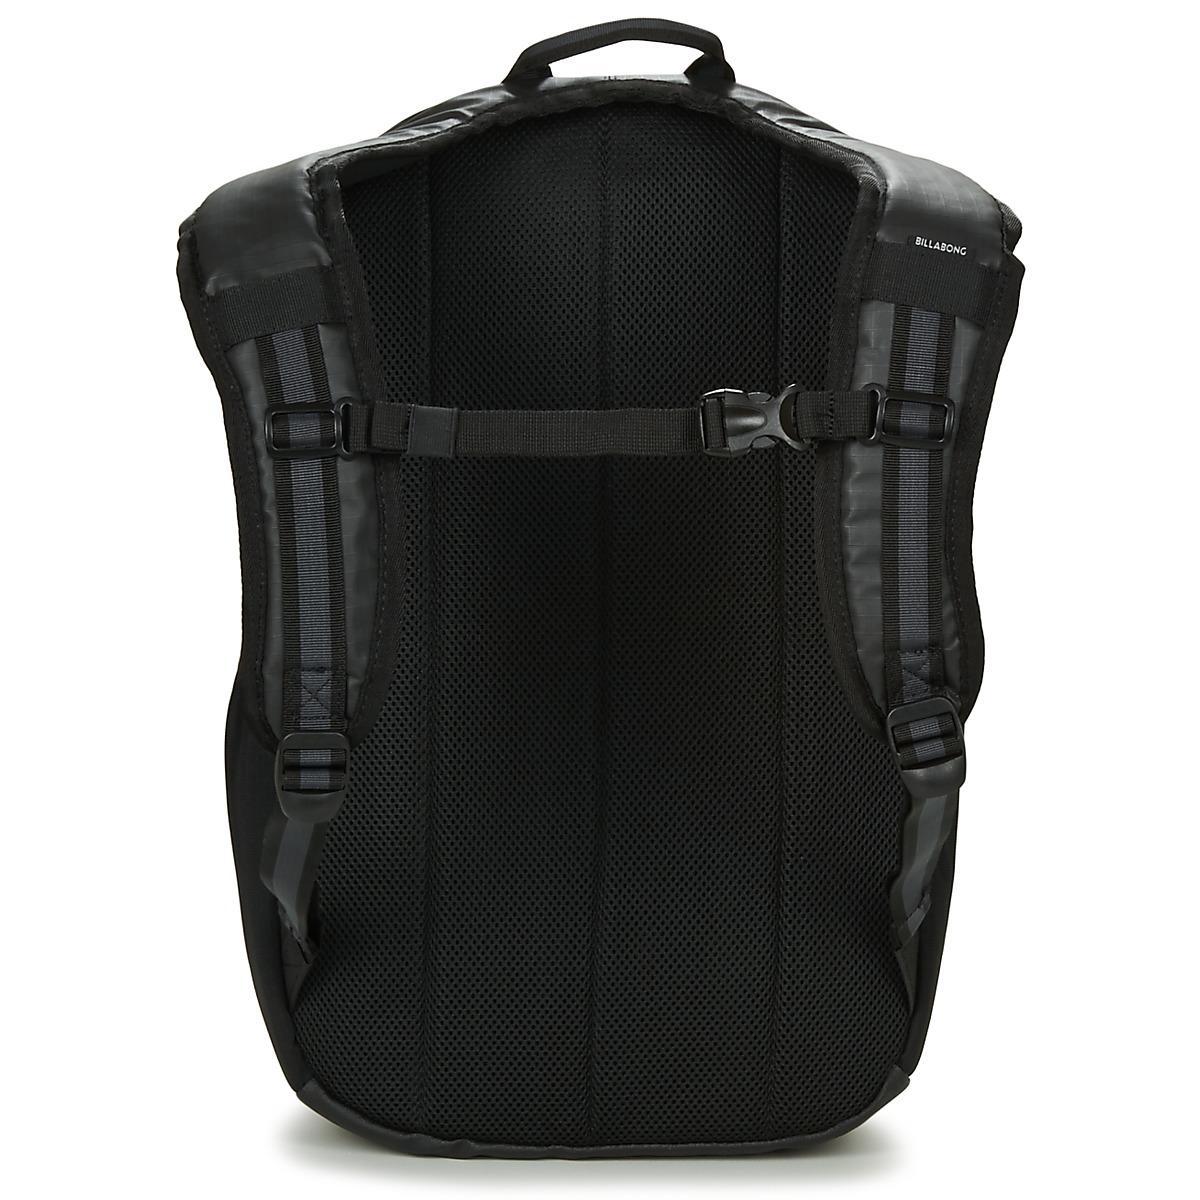 Billabong Command Skate Pack 27l Men's Backpack In Black for Men